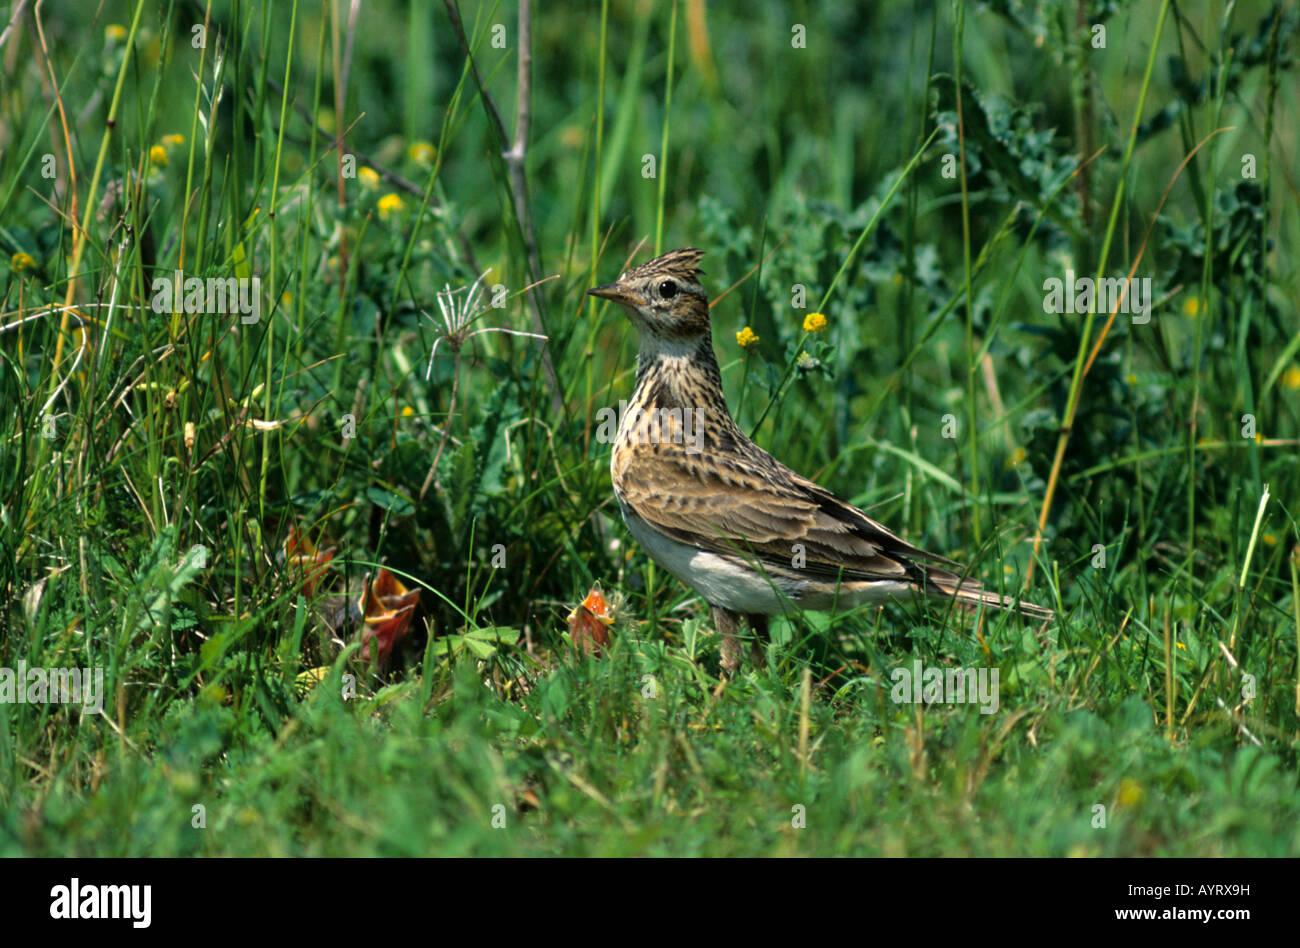 Skylark (Alauda arvensis), Lark family, young in nest - Stock Image